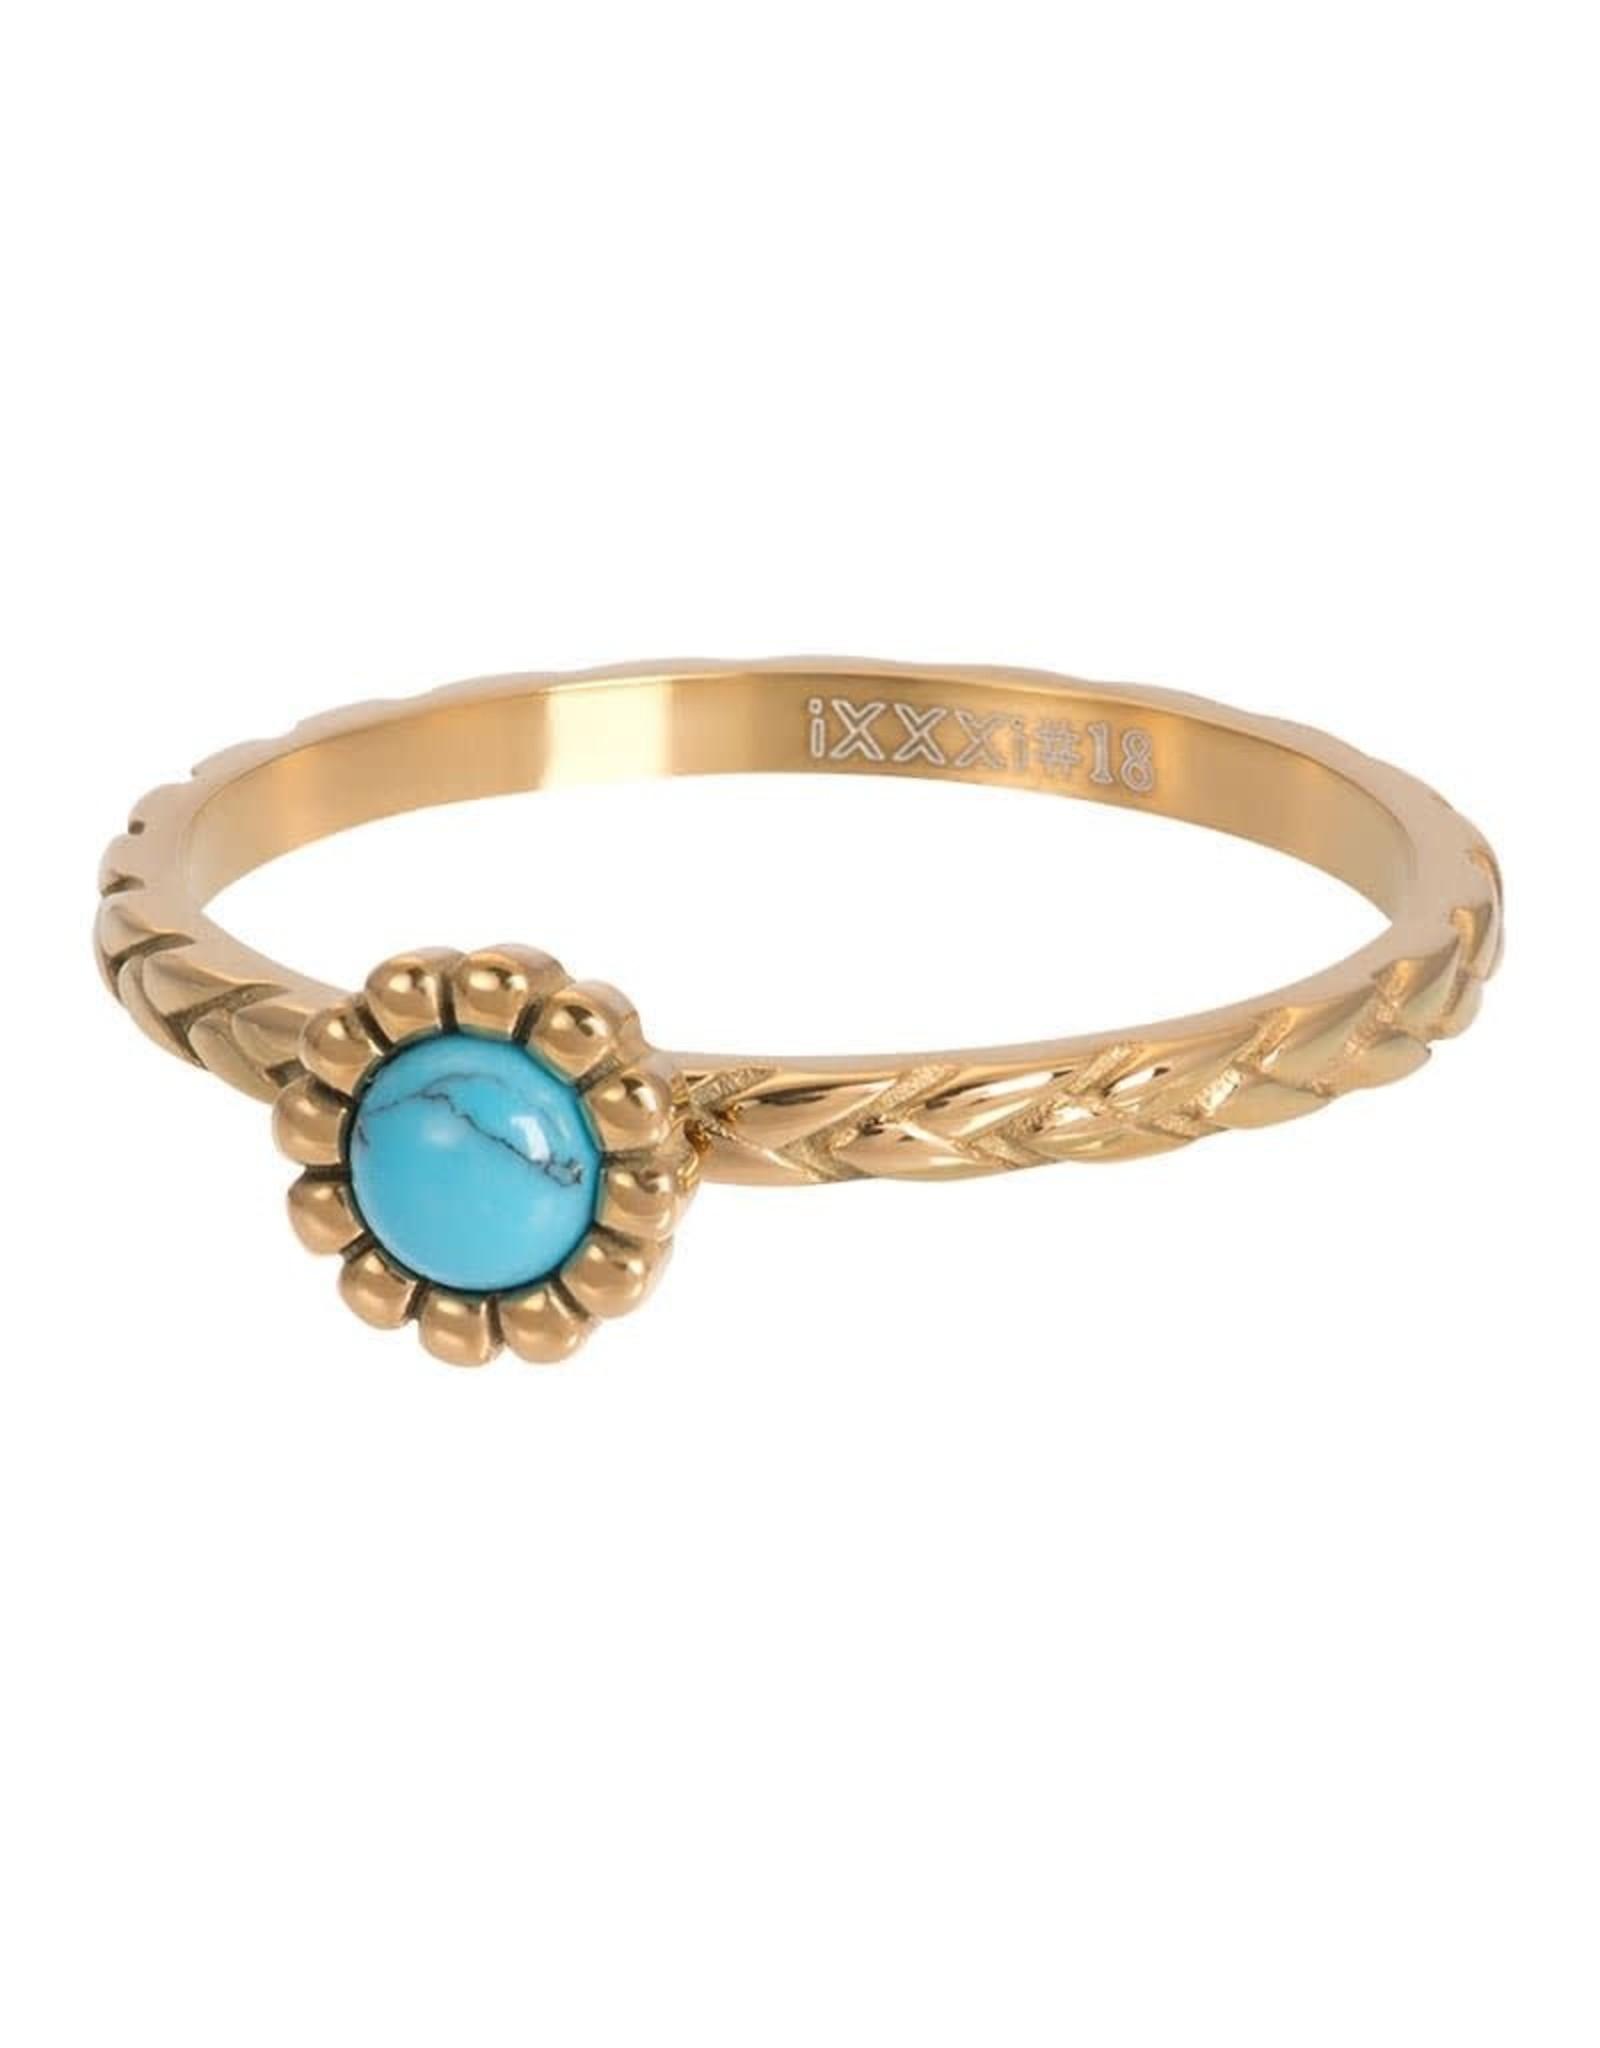 iXXXi Jewelry iXXXi vulring inspired turquoise - goud